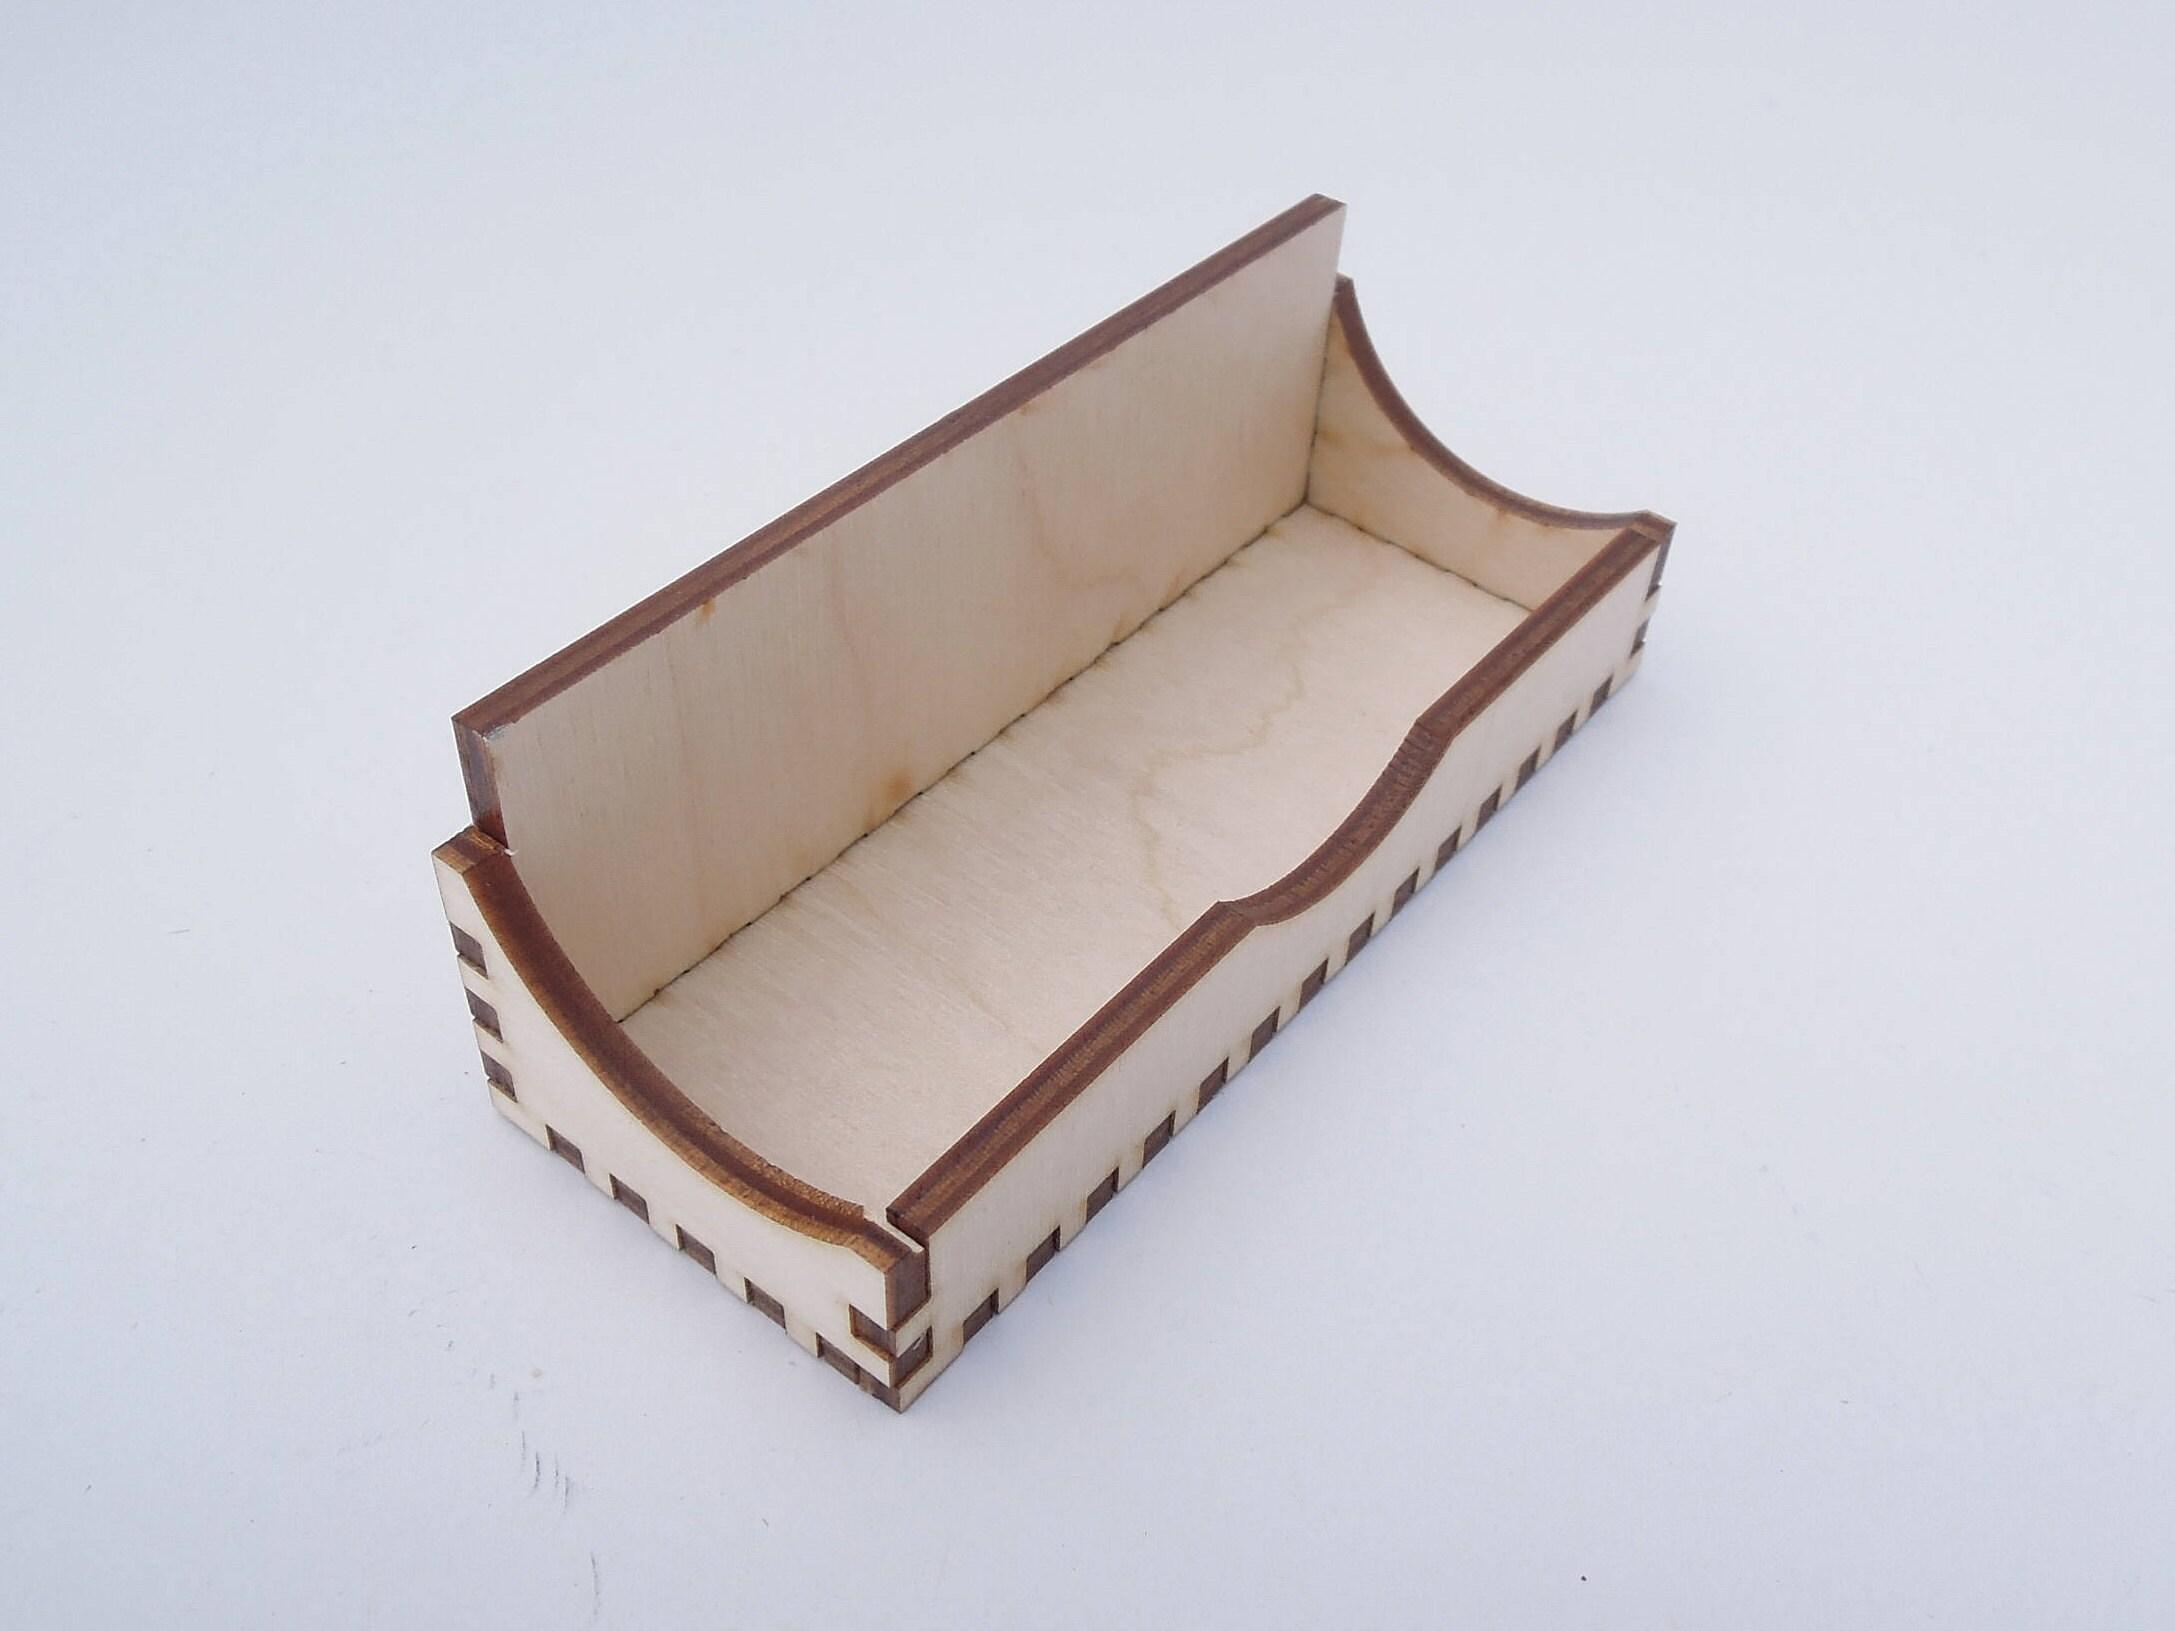 Wooden Business Card Holder For Crafts